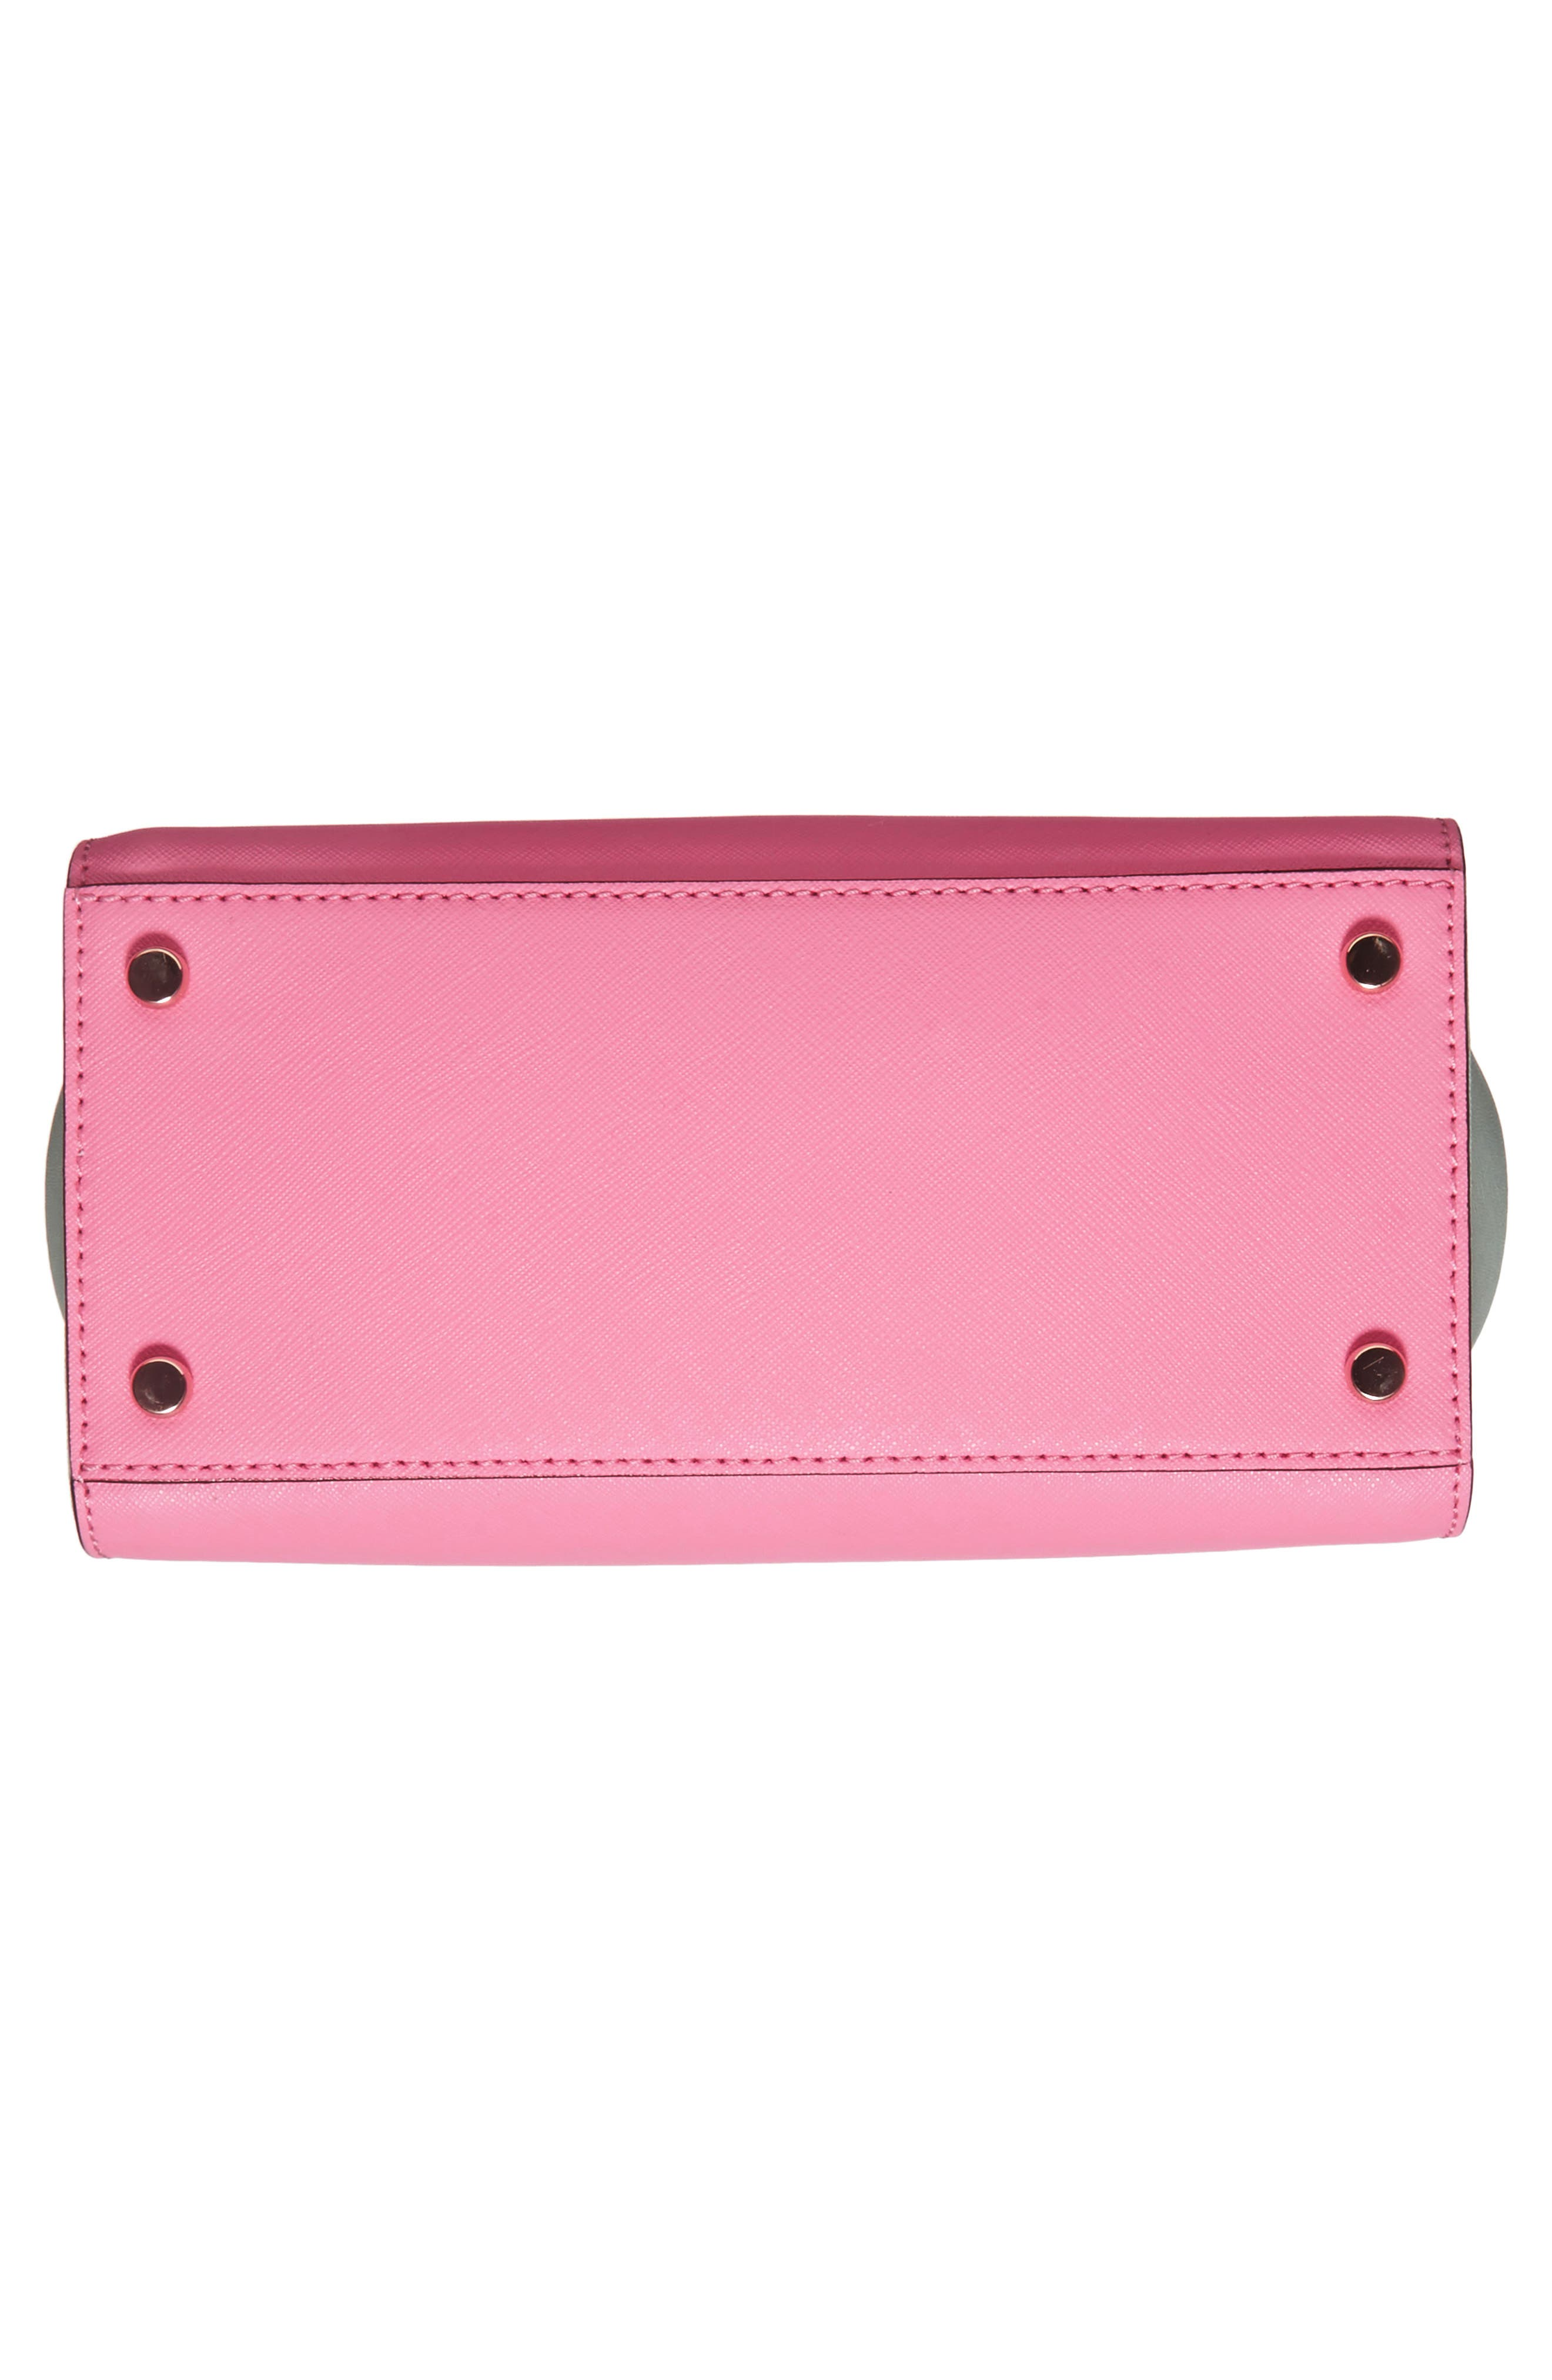 KATE SPADE NEW YORK,                             'cameron street - mini candace' leather satchel,                             Alternate thumbnail 6, color,                             690